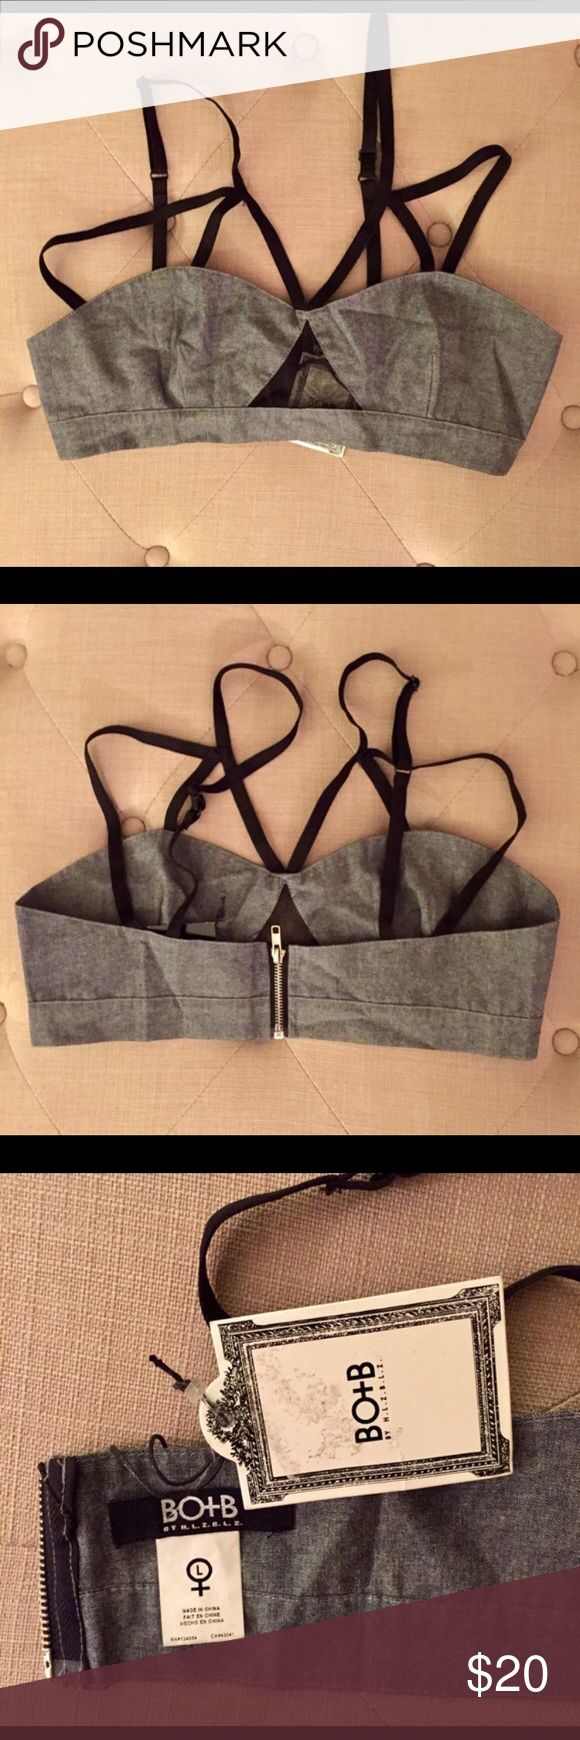 HLZBLZ denim zip up bra Leyte NWT Mercer worn. Denim zip up bralette with adjustable straps. Fun little mesh peekaboo window detail on front. Zipper works perfectly. Straps are elastic Intimates & Sleepwear Bras